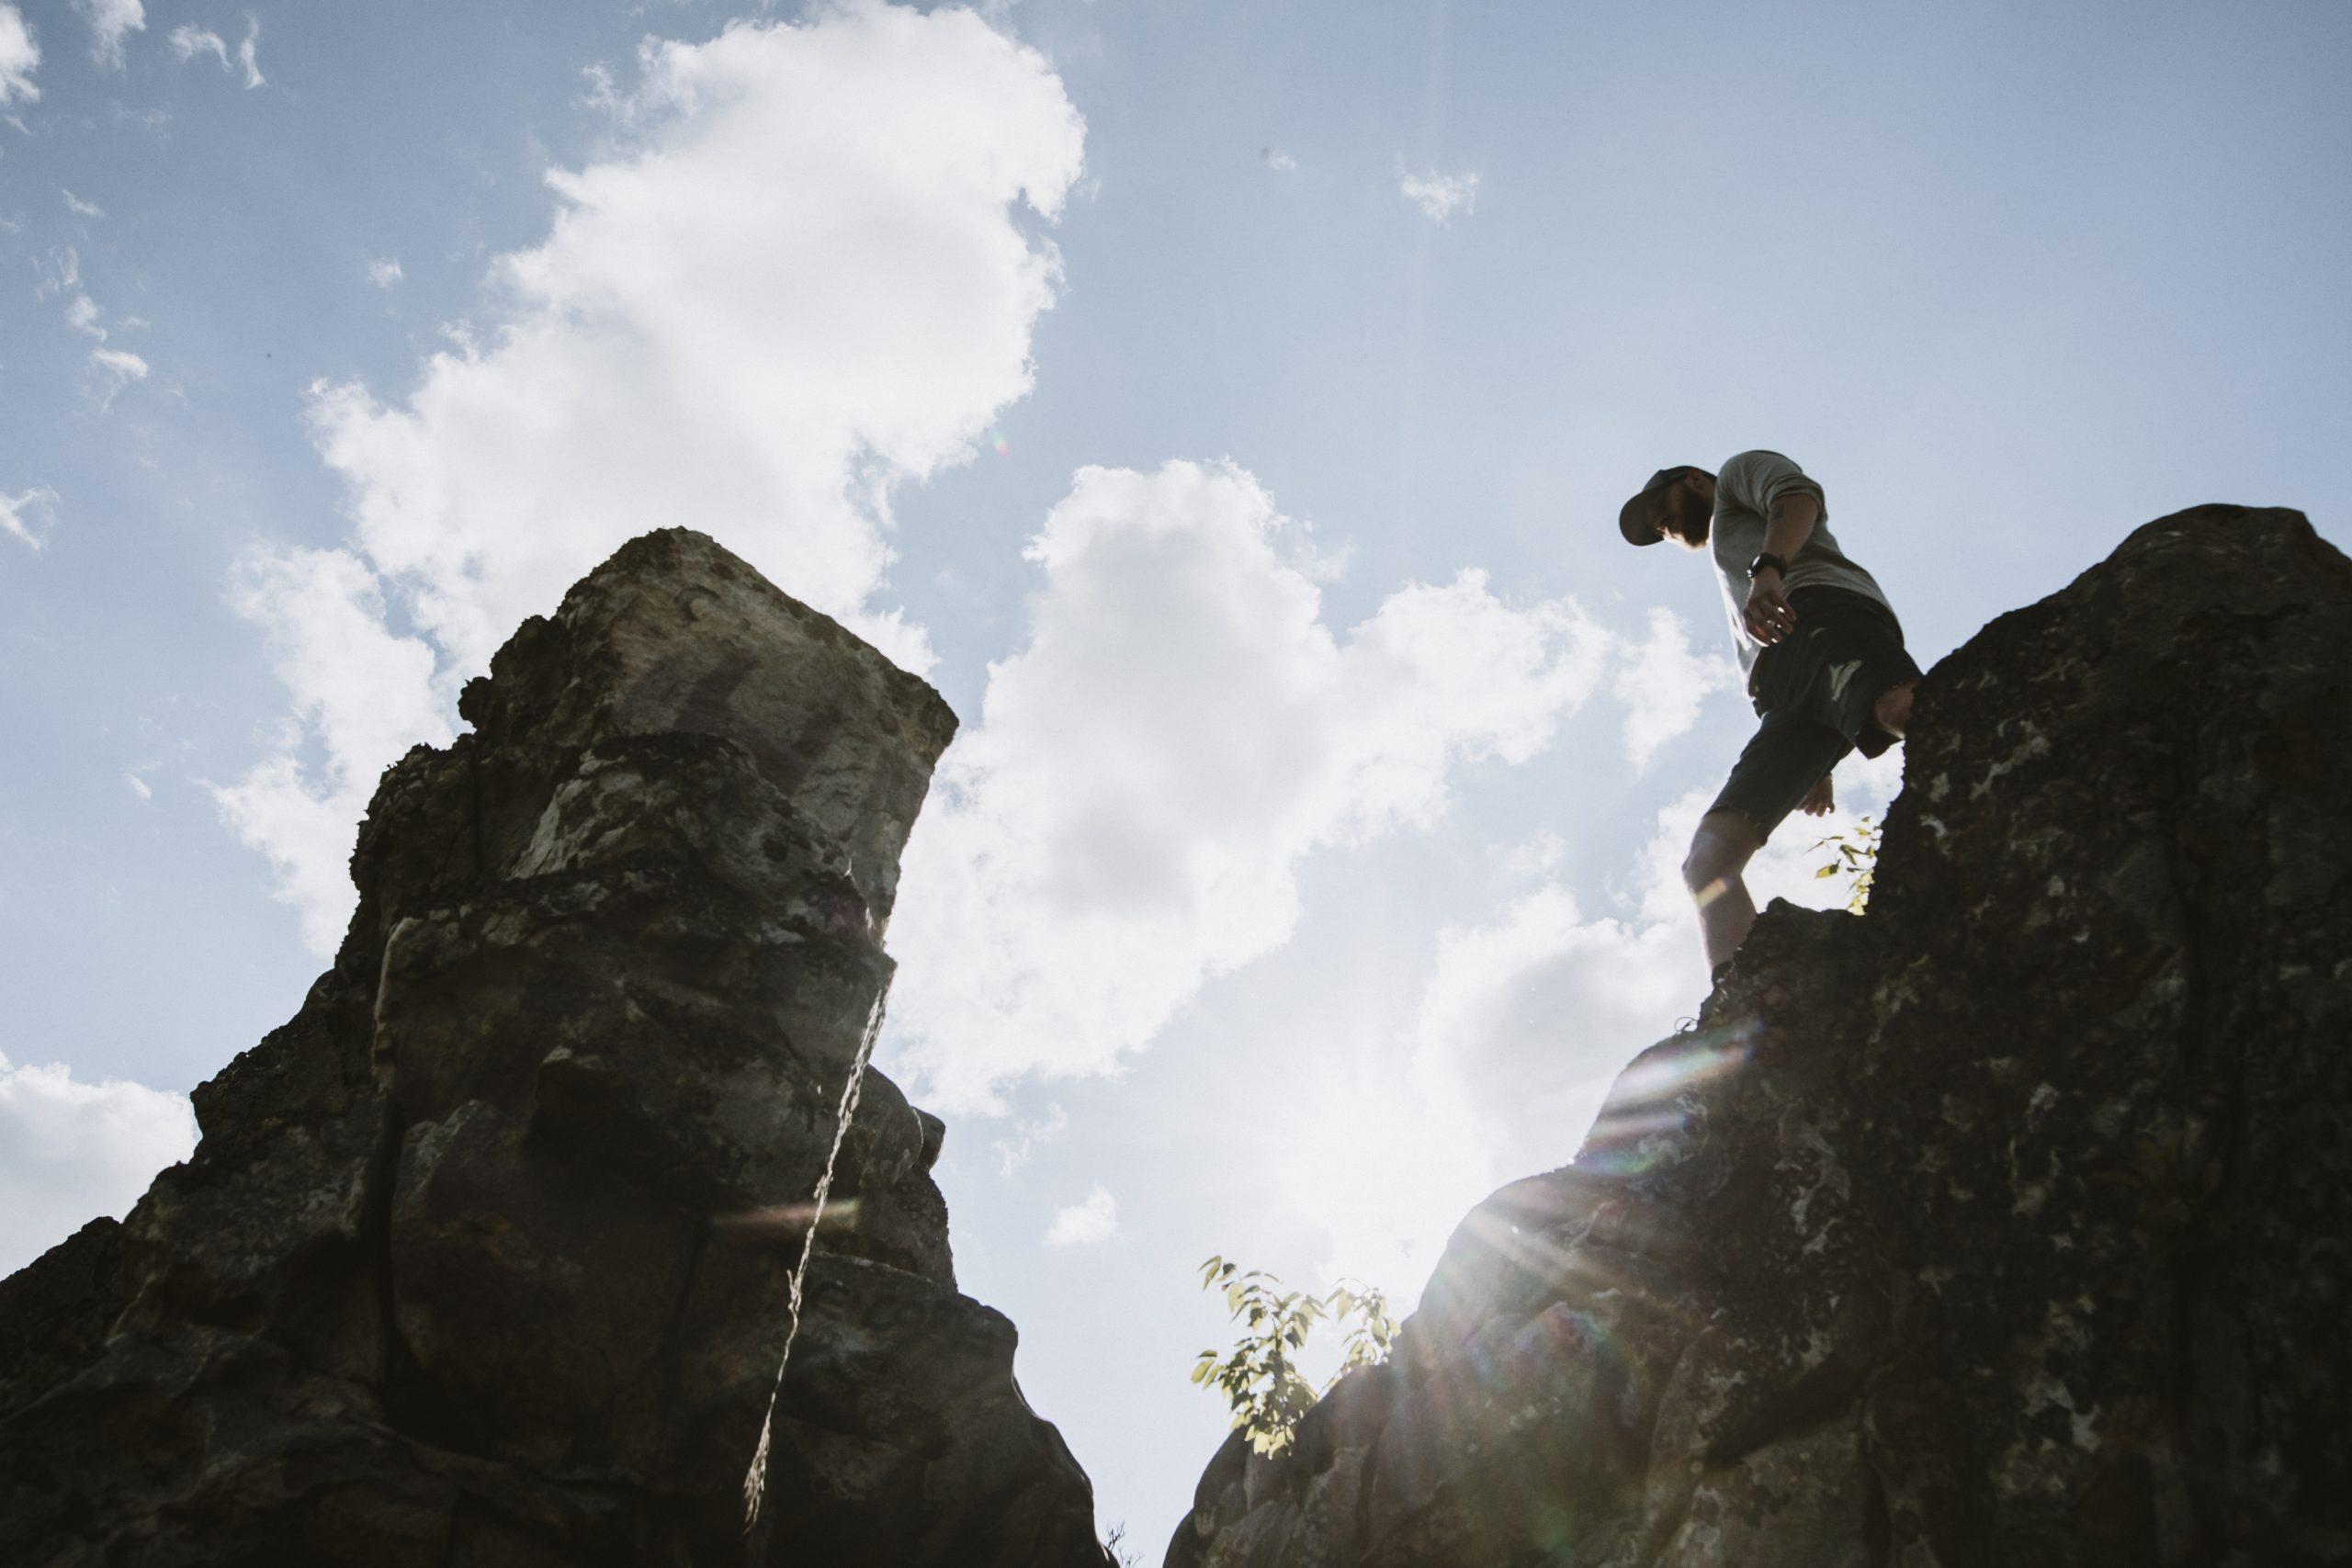 Explore Pinnacle Rock State Park like never before!